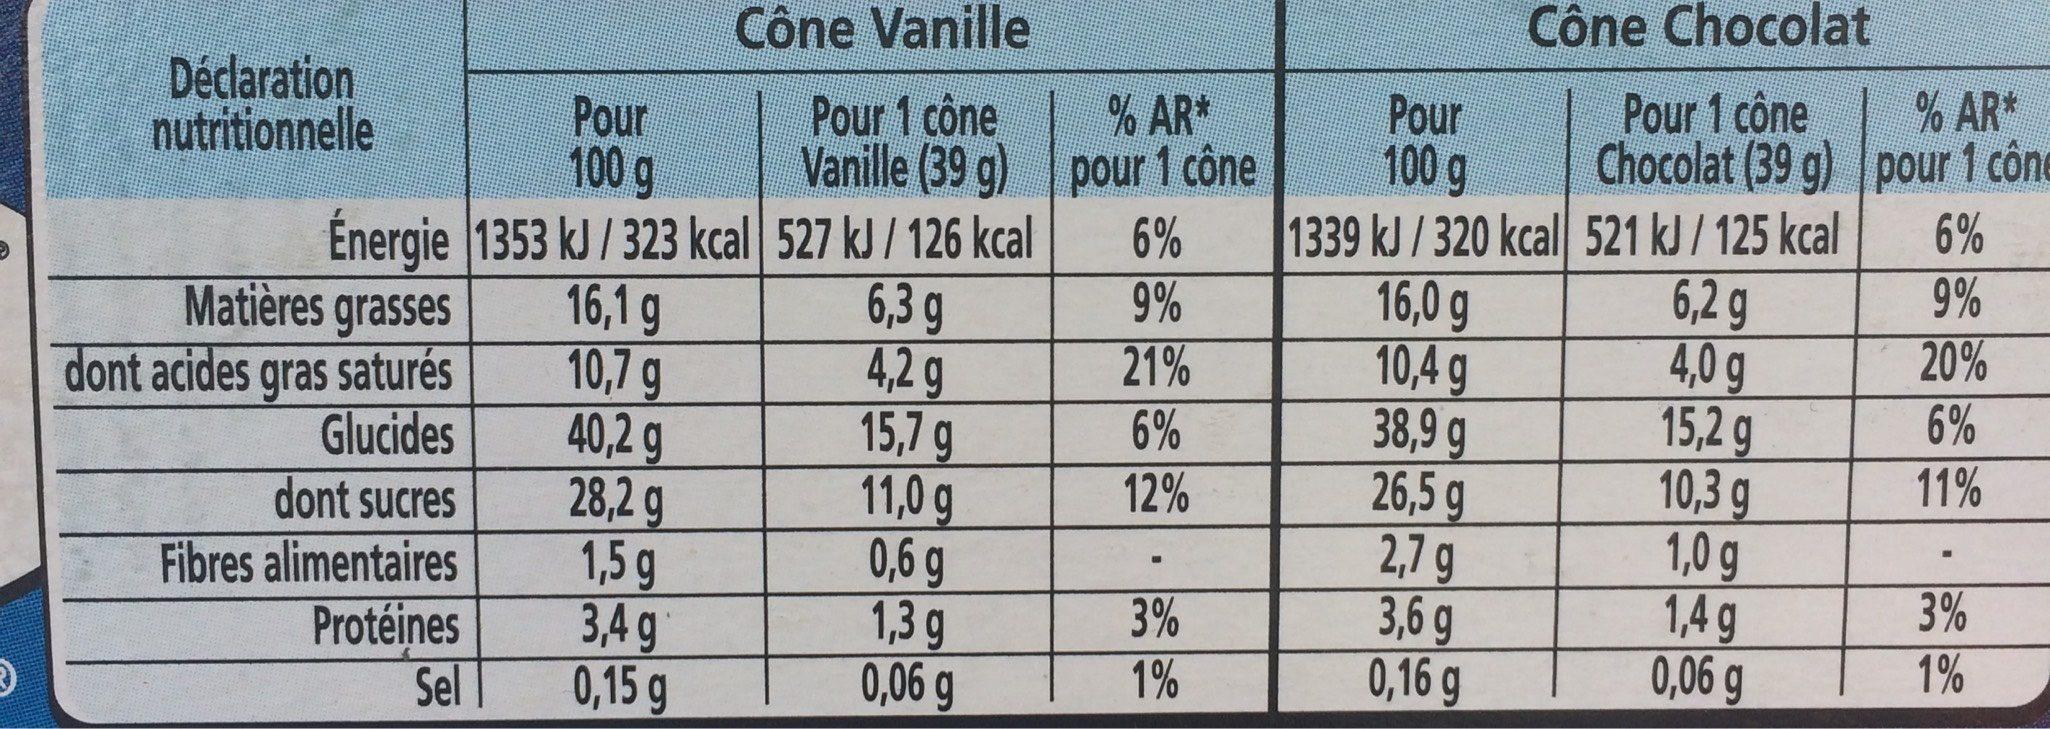 Mini cônes vanille nougatine & chocolat nougatine - Voedigswaarden